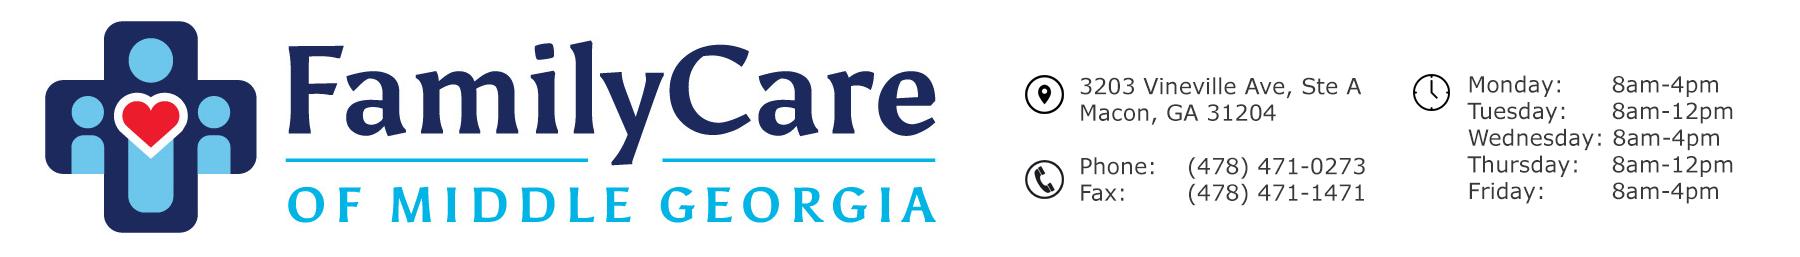 Family Care of Middle Georgia